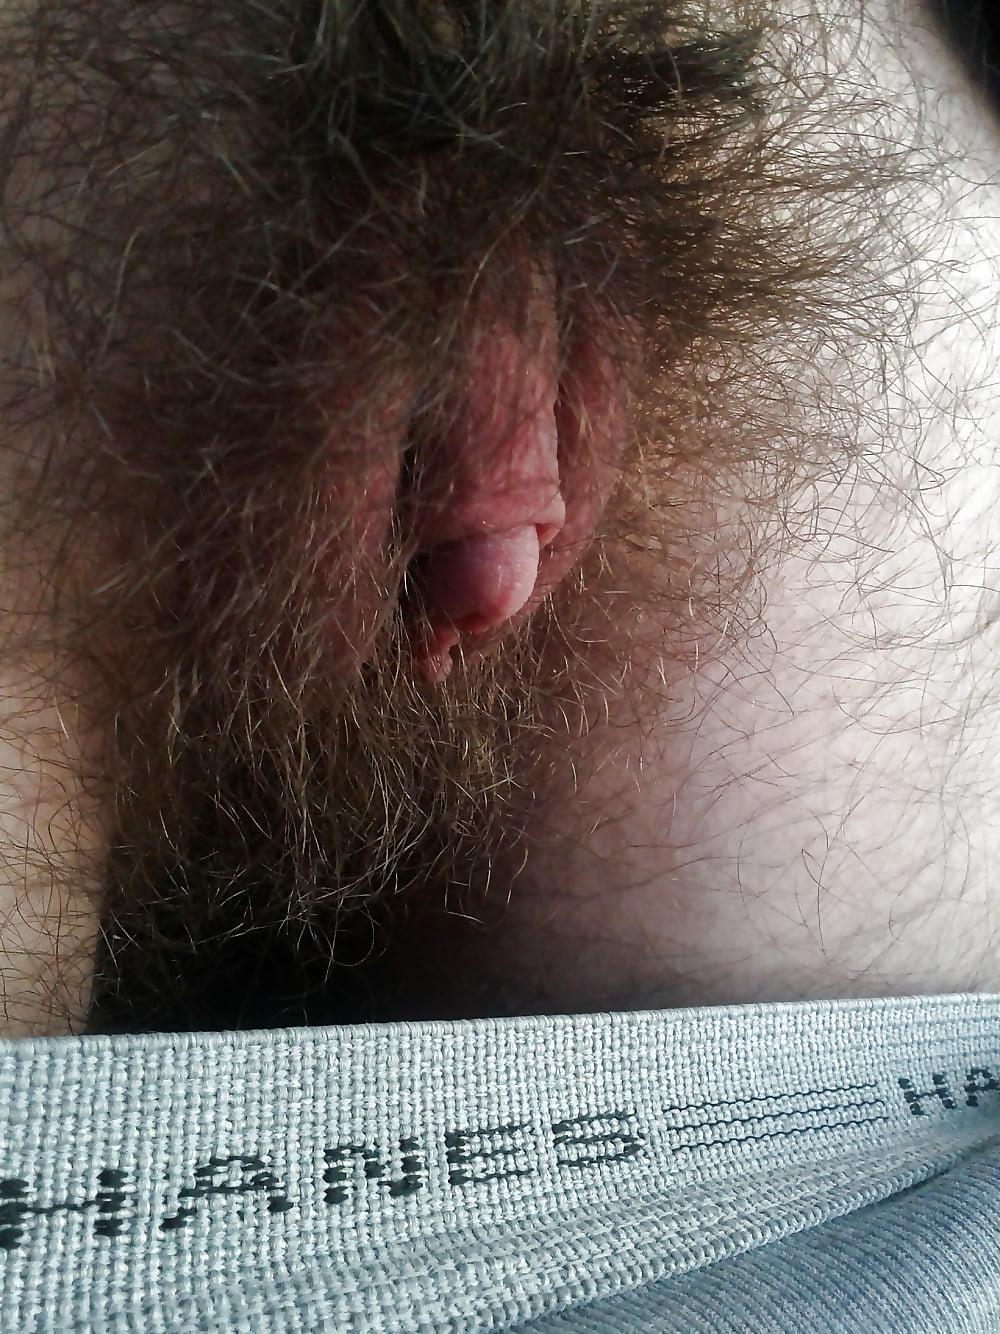 Porn large clitoris-2491